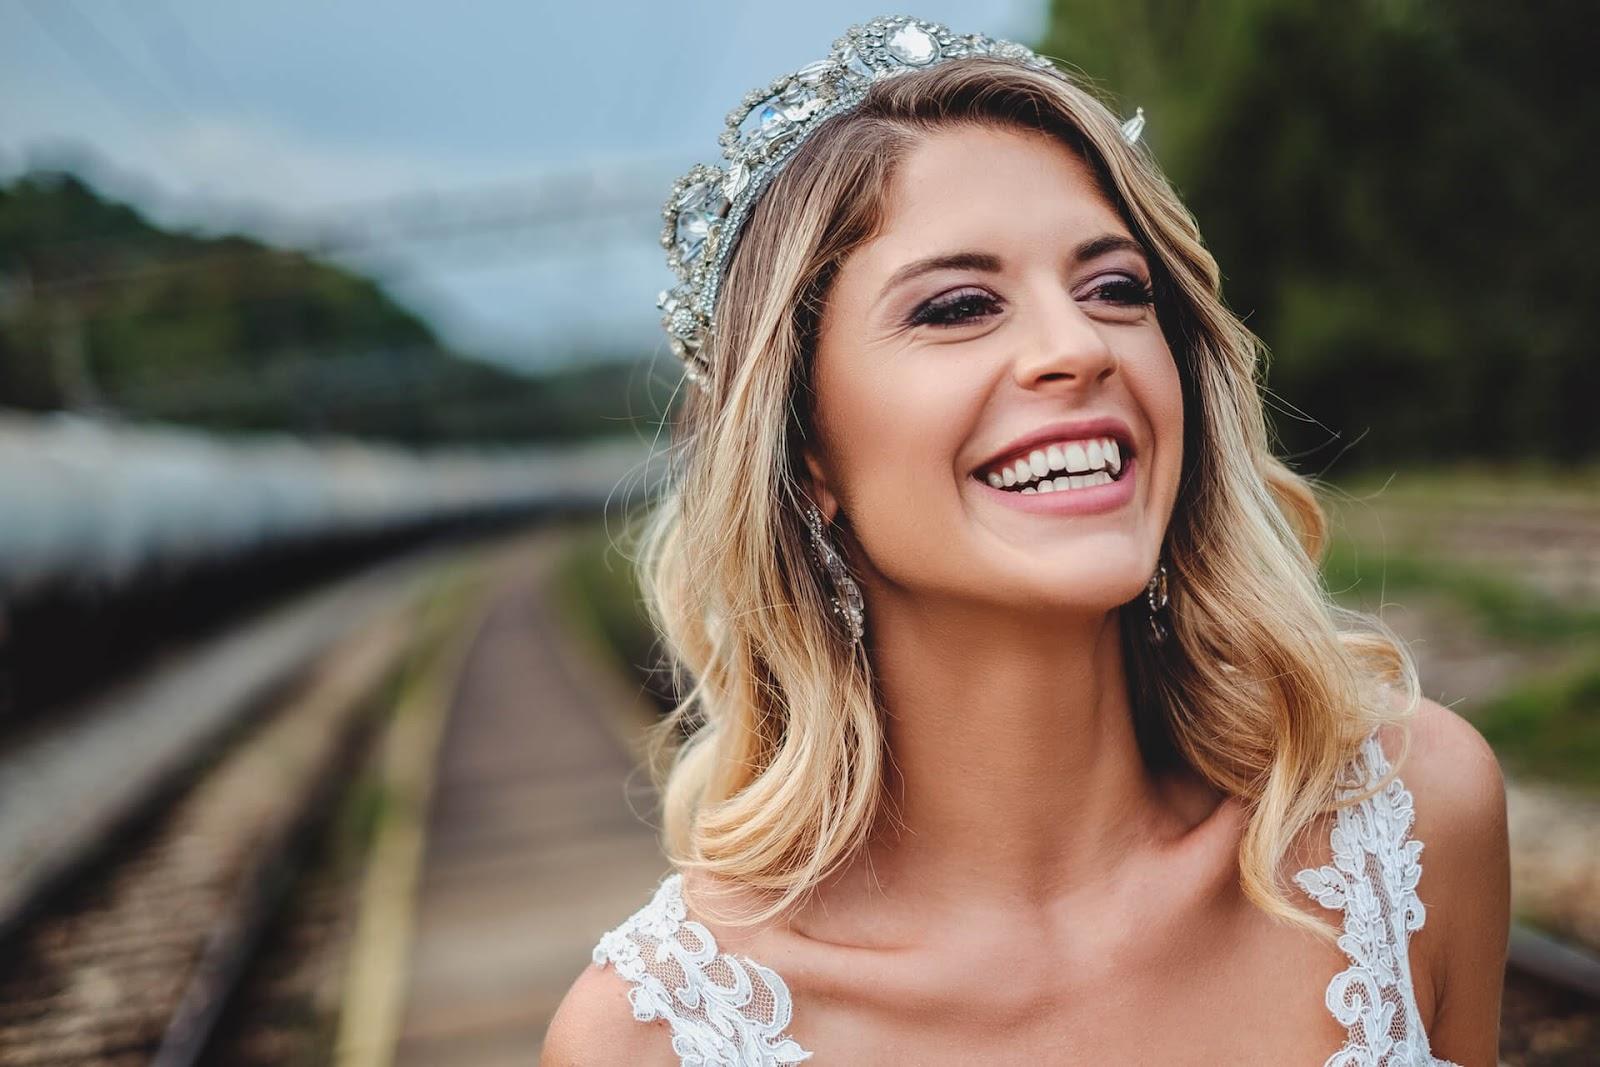 Bride wearing a tiara and smiling